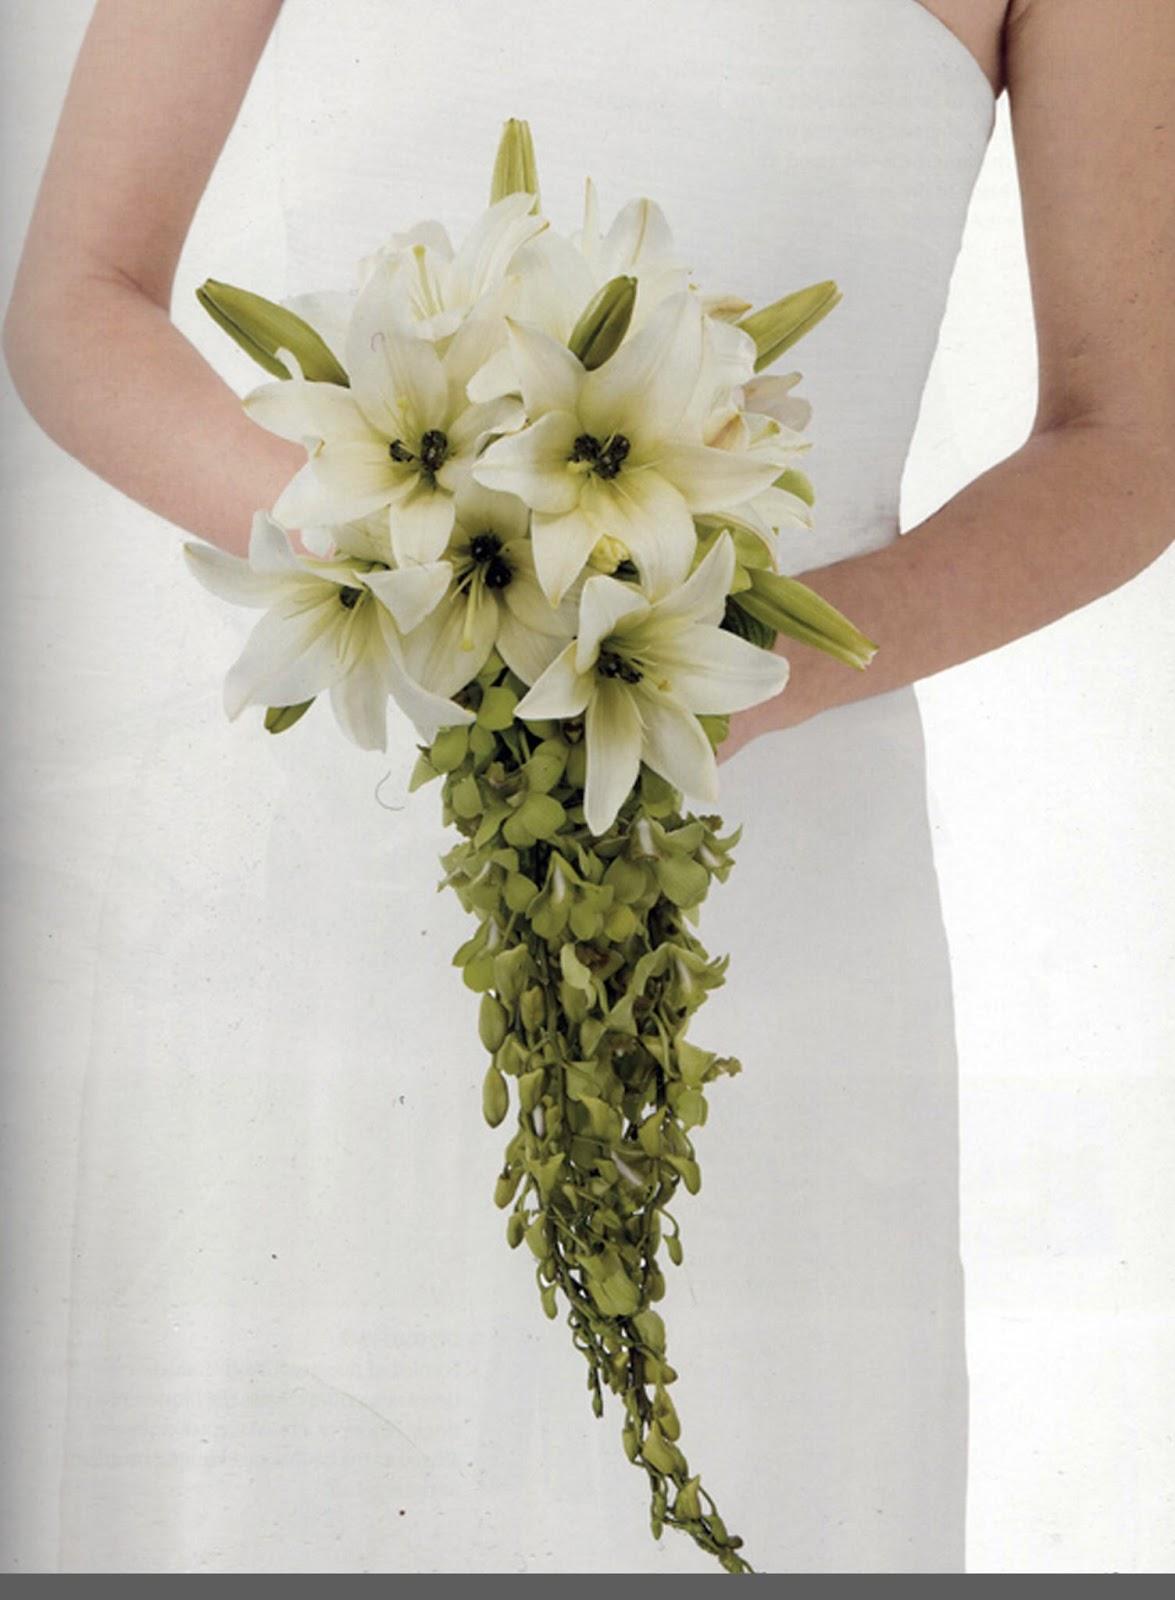 Lilies wedding flowers wedding flowers ideas lilies wedding flowers izmirmasajfo